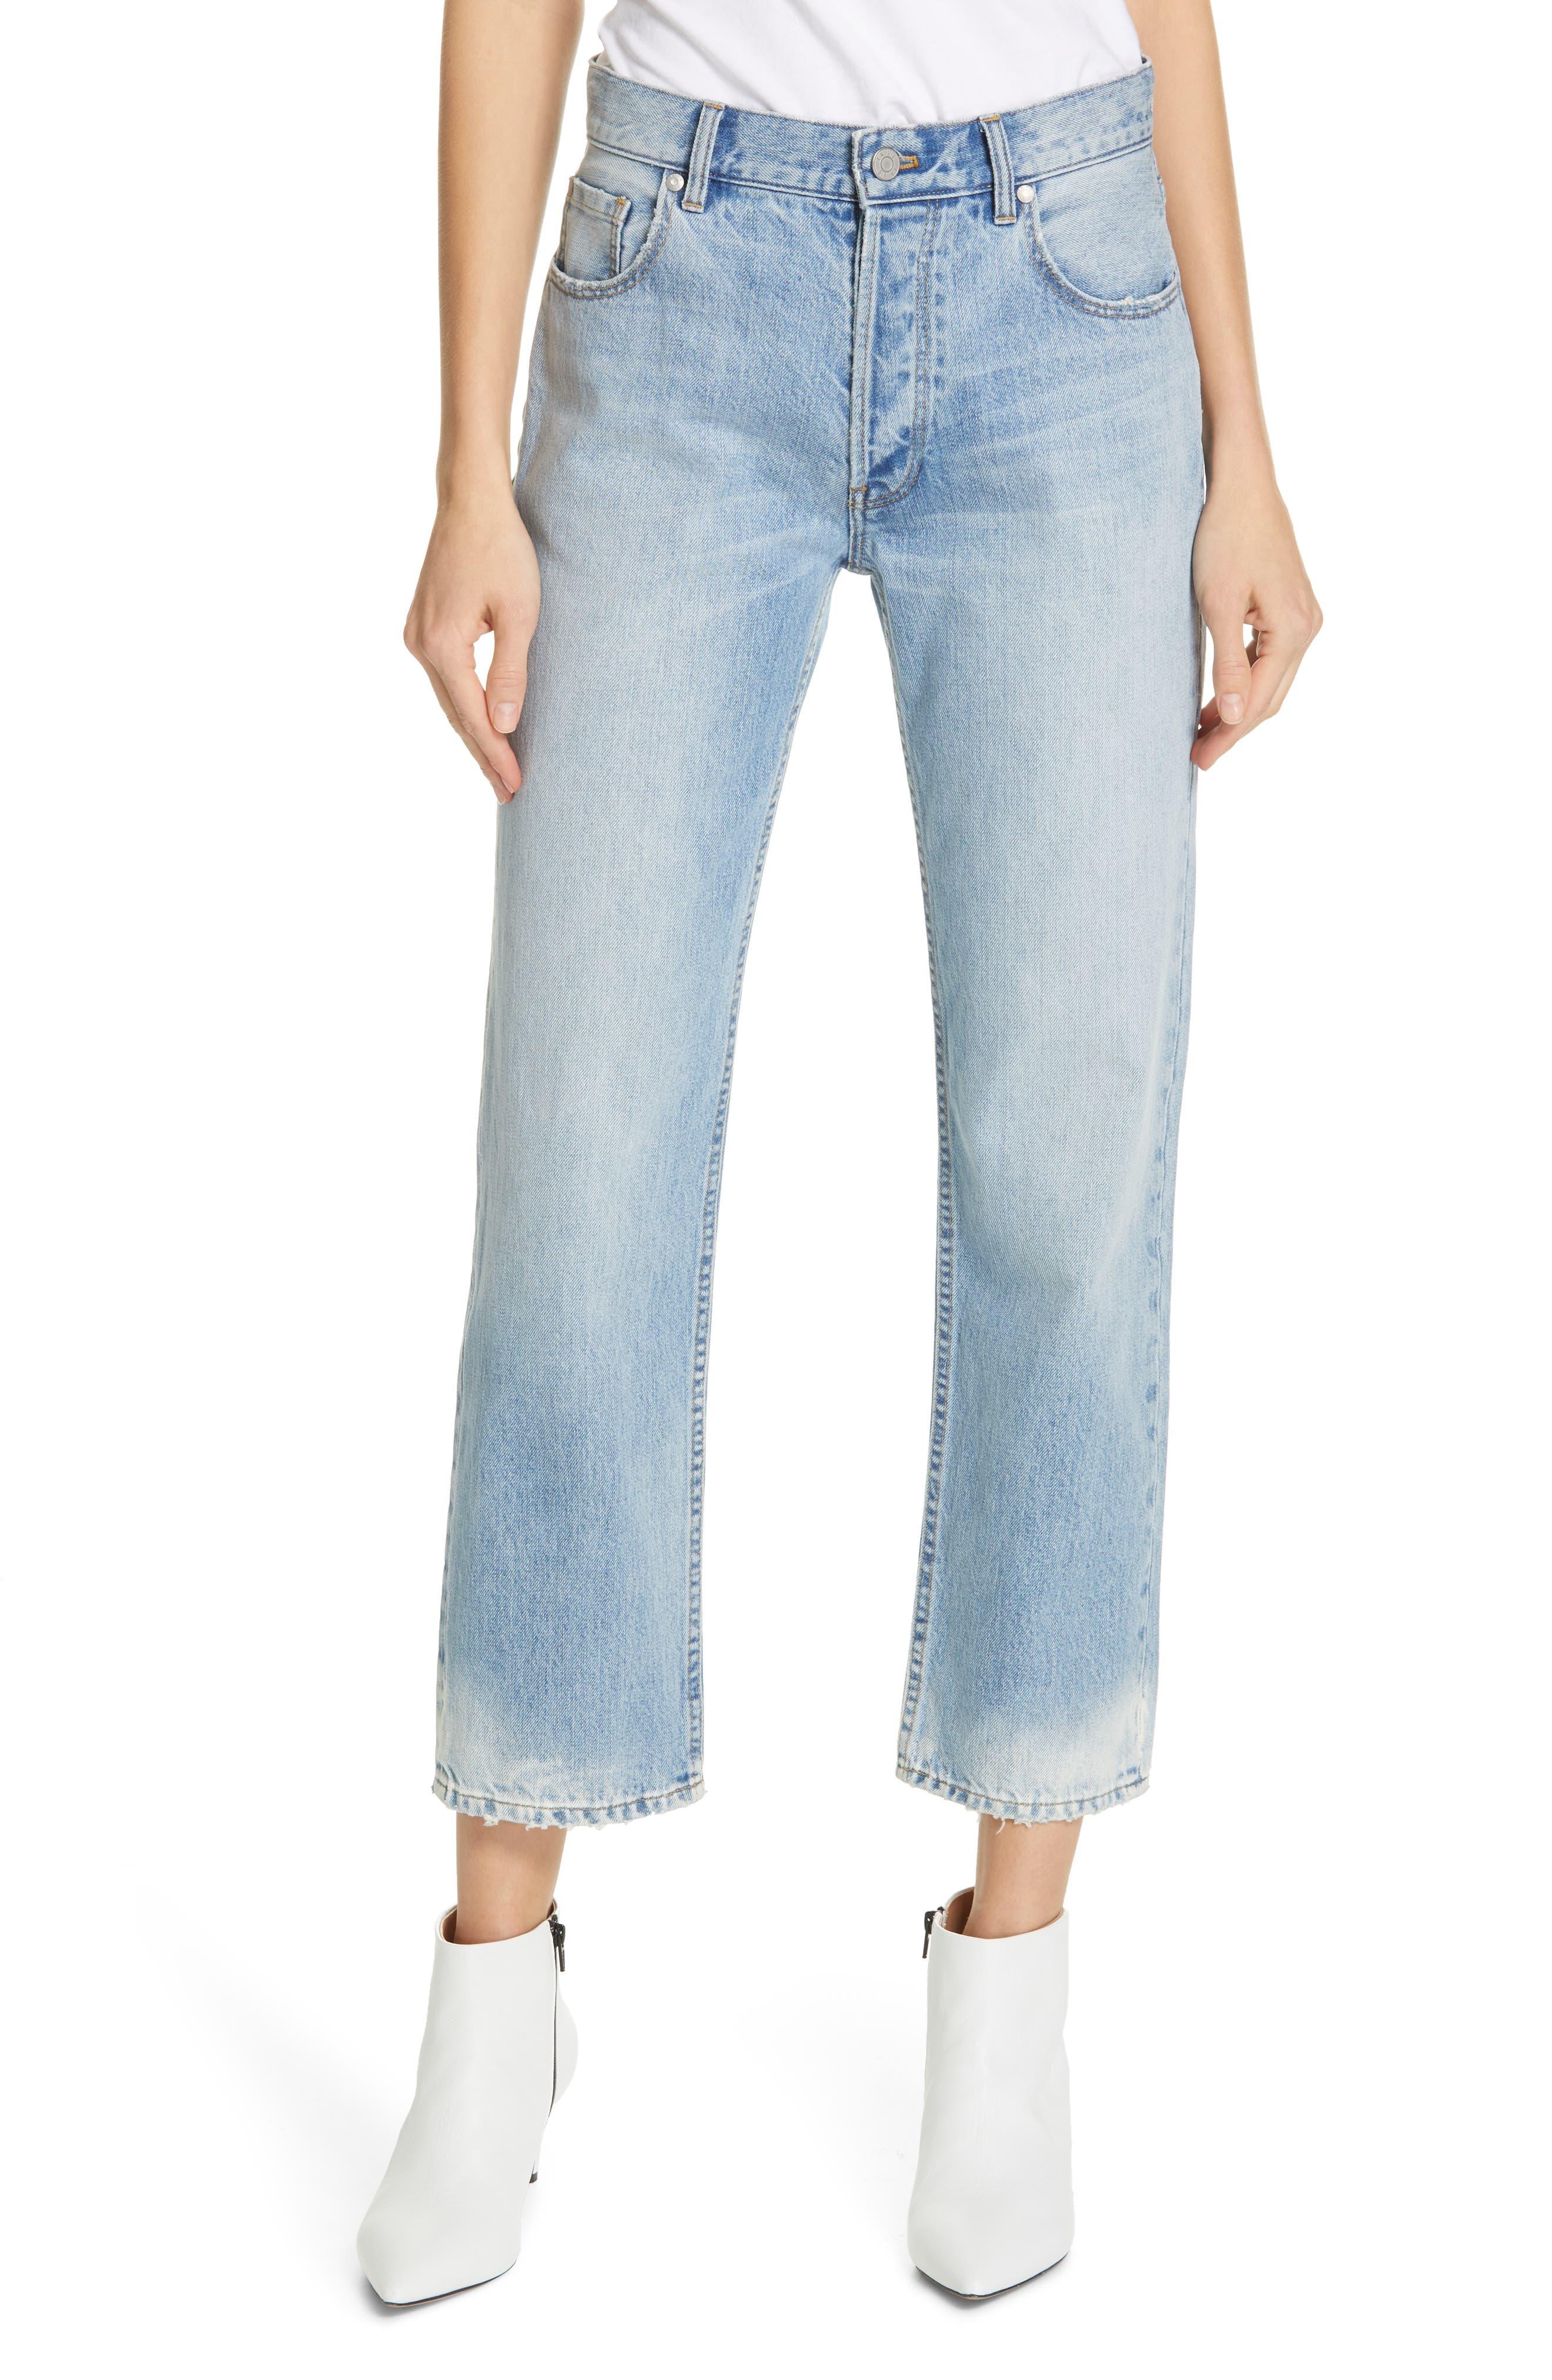 LA VIE REBECCA TAYLOR Sylvie High Waist Jeans, Main, color, CHANTAL WASH